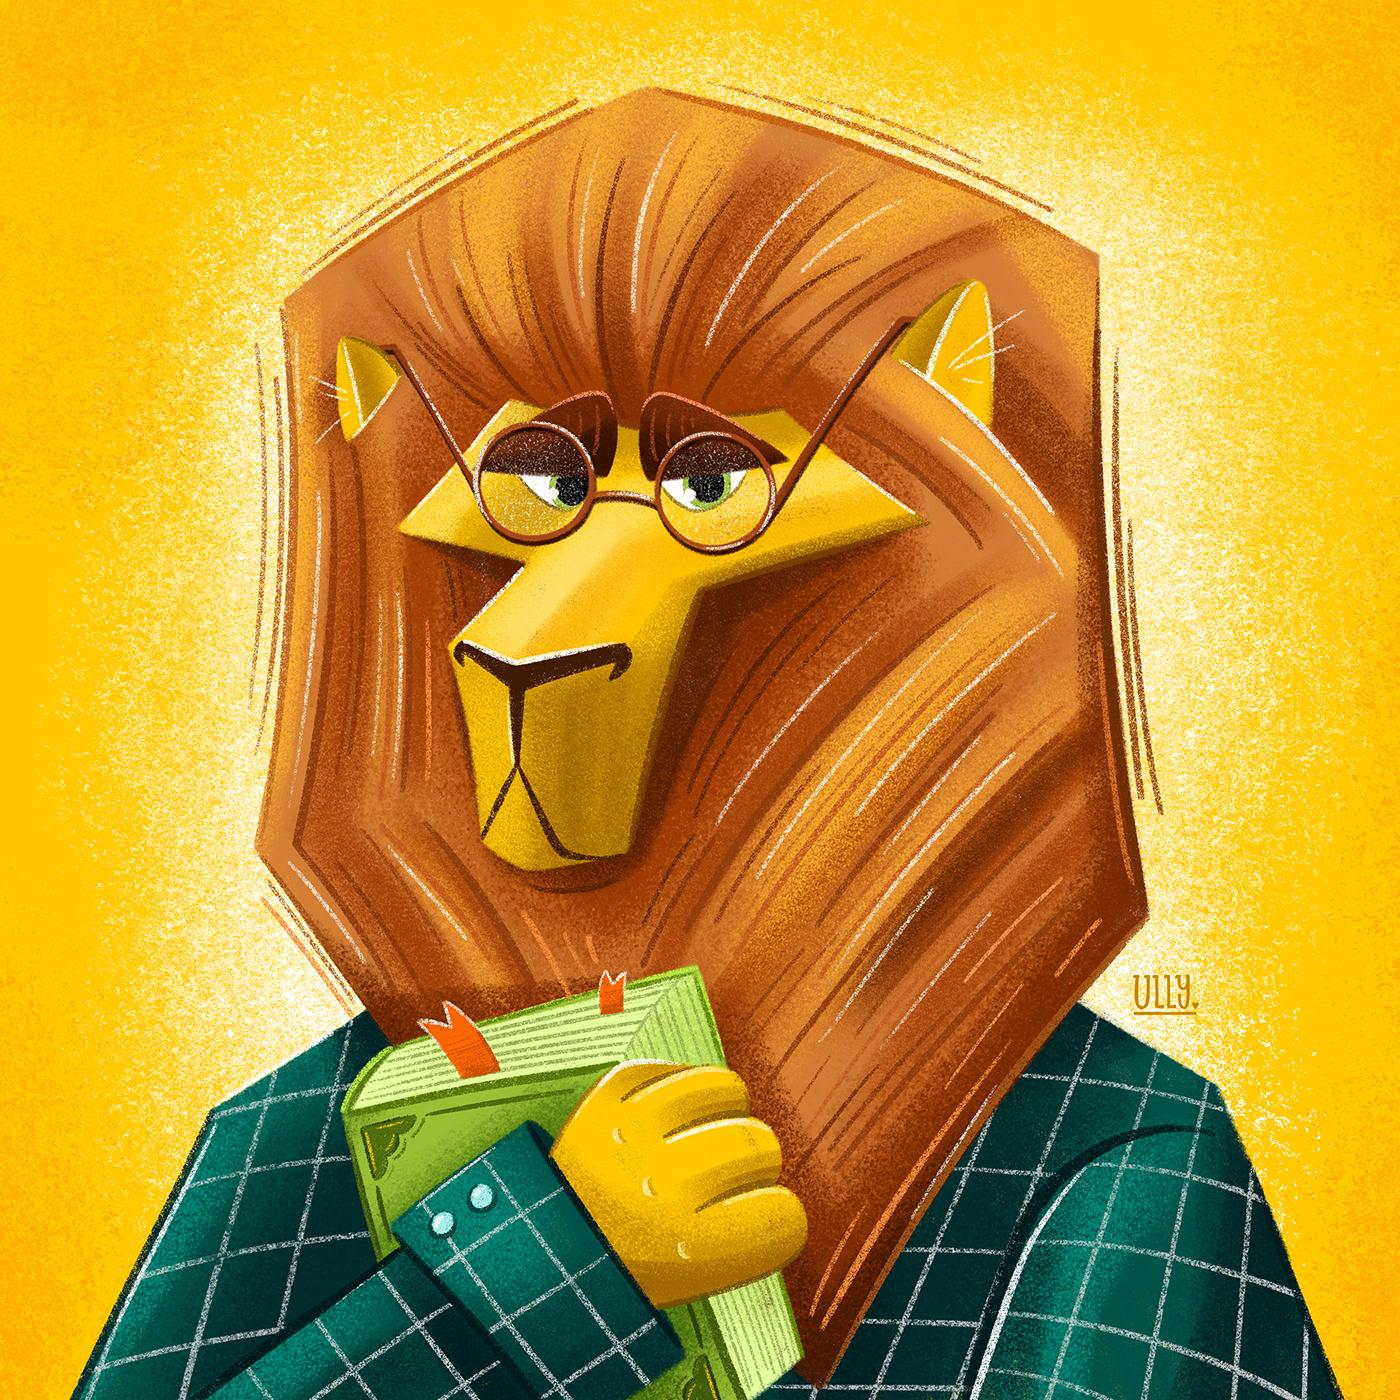 animals cartoon cartoon character Character Character design  character illustration children illustration digital illustration kids illustration mascot design